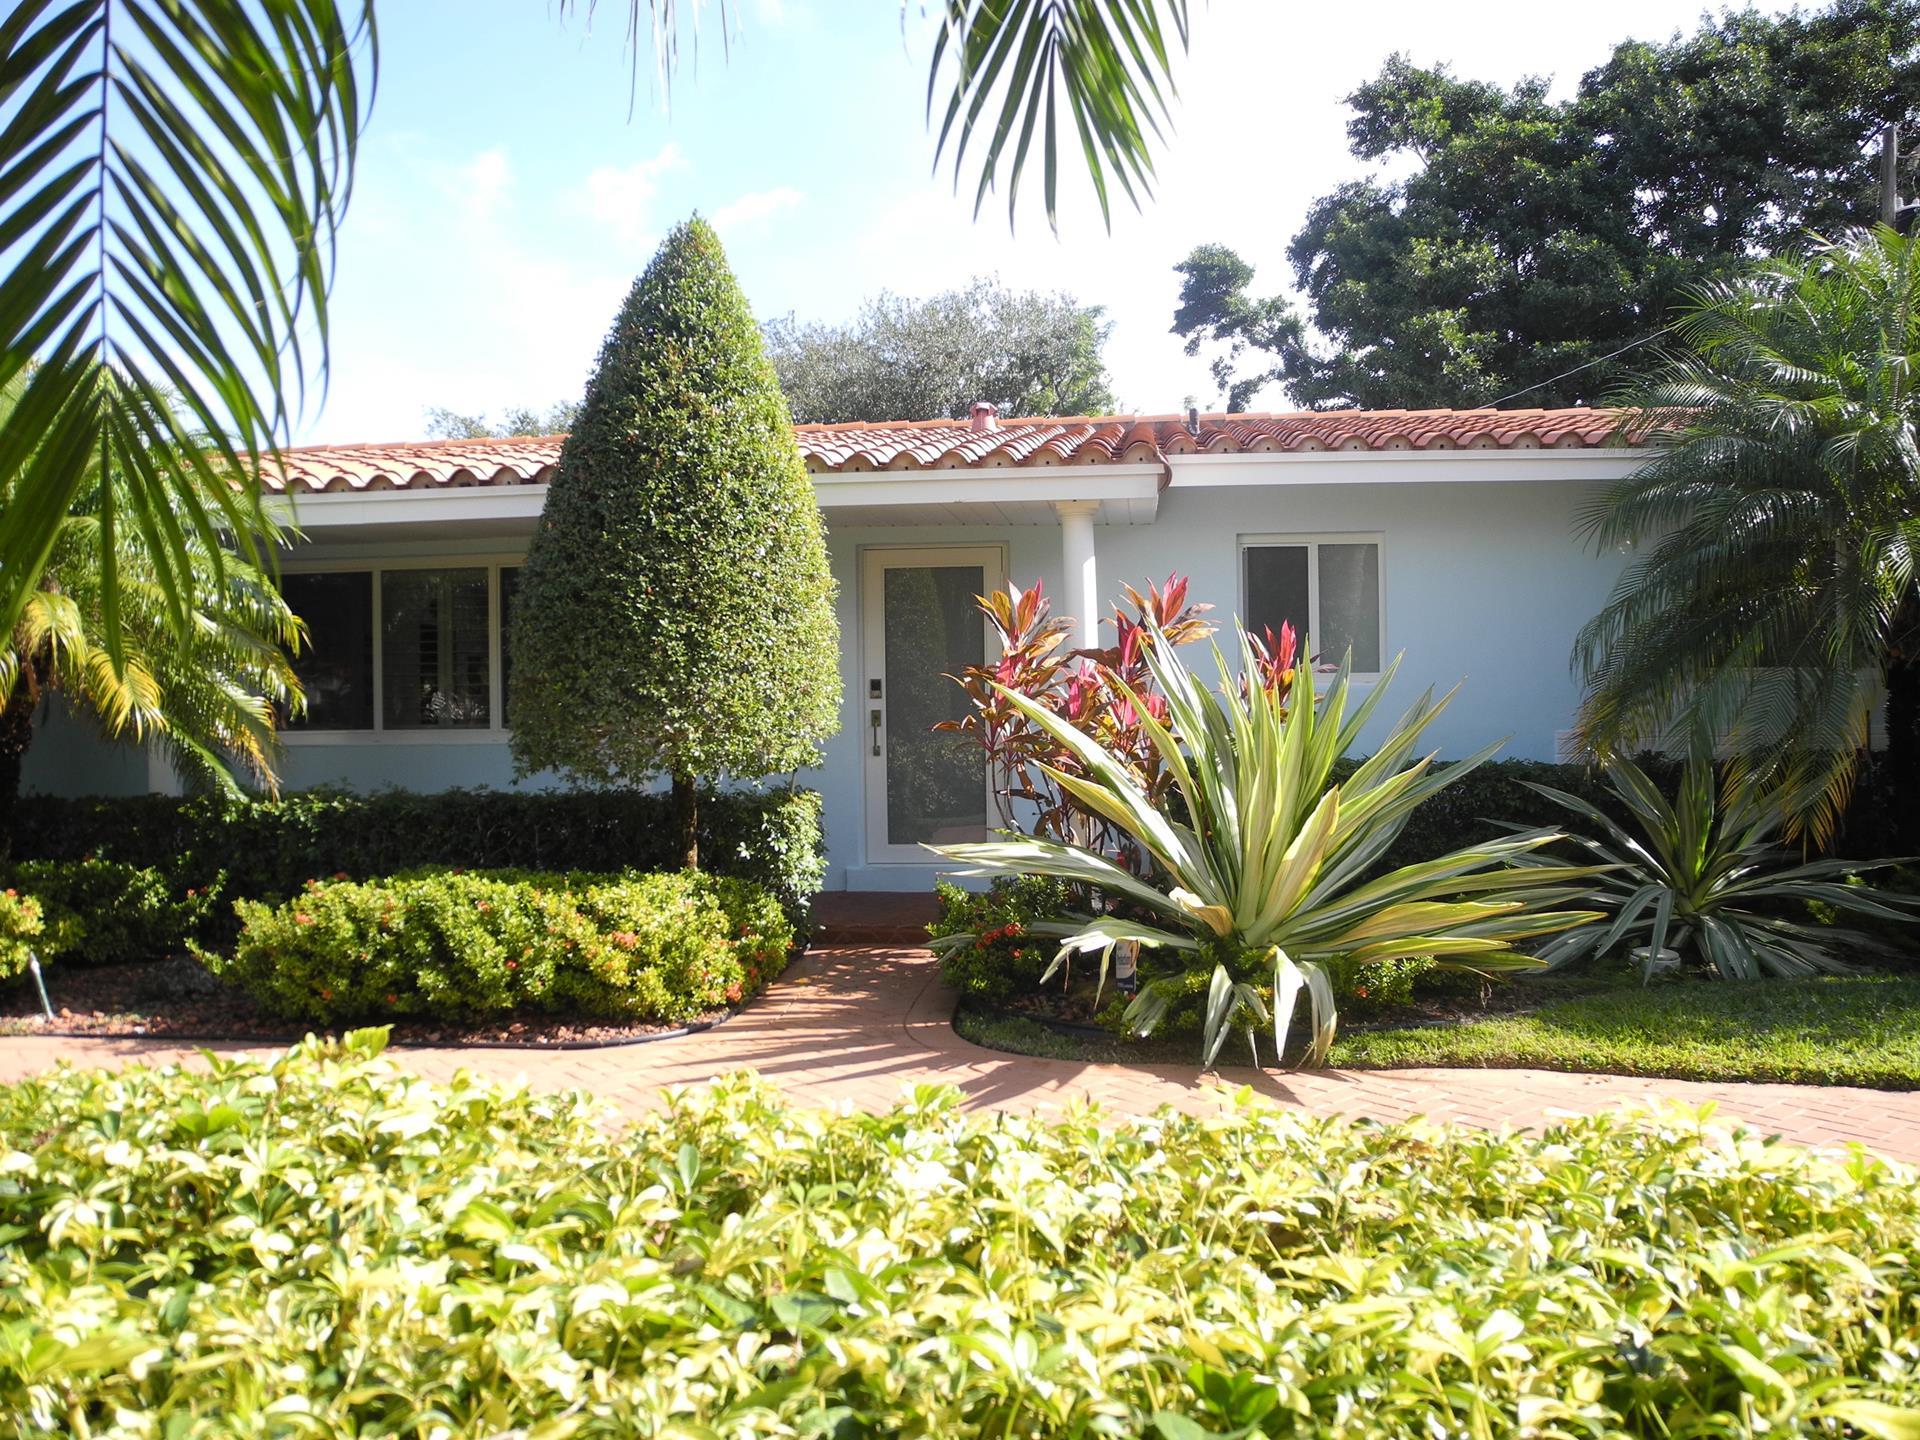 10295 NW 1st Ave - Miami Shores, Florida